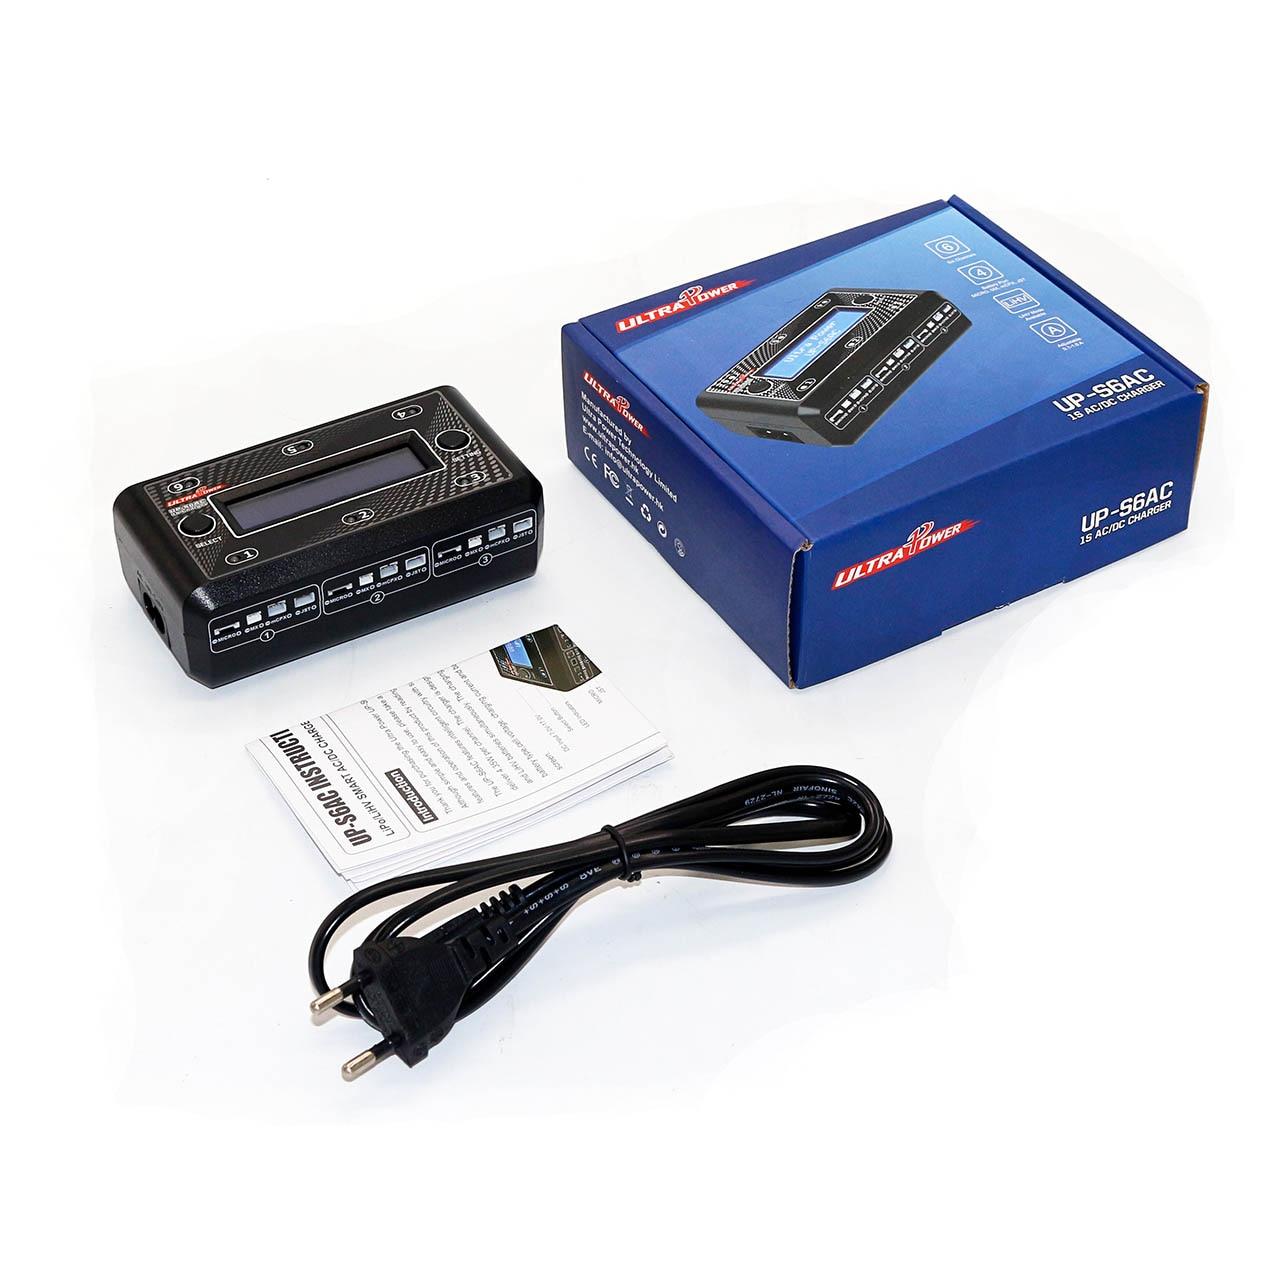 Image 4 - Emax 超電源 UP S6AC 6 × 4.35 ワット 1 1 8s リポ/LiHV バッテリーチャージャーのサポートマイクロ MX mCPX JST ポート Rc Plnae FPV ドローンレース -    グループ上の おもちゃ & ホビー からの パーツ & アクセサリー の中